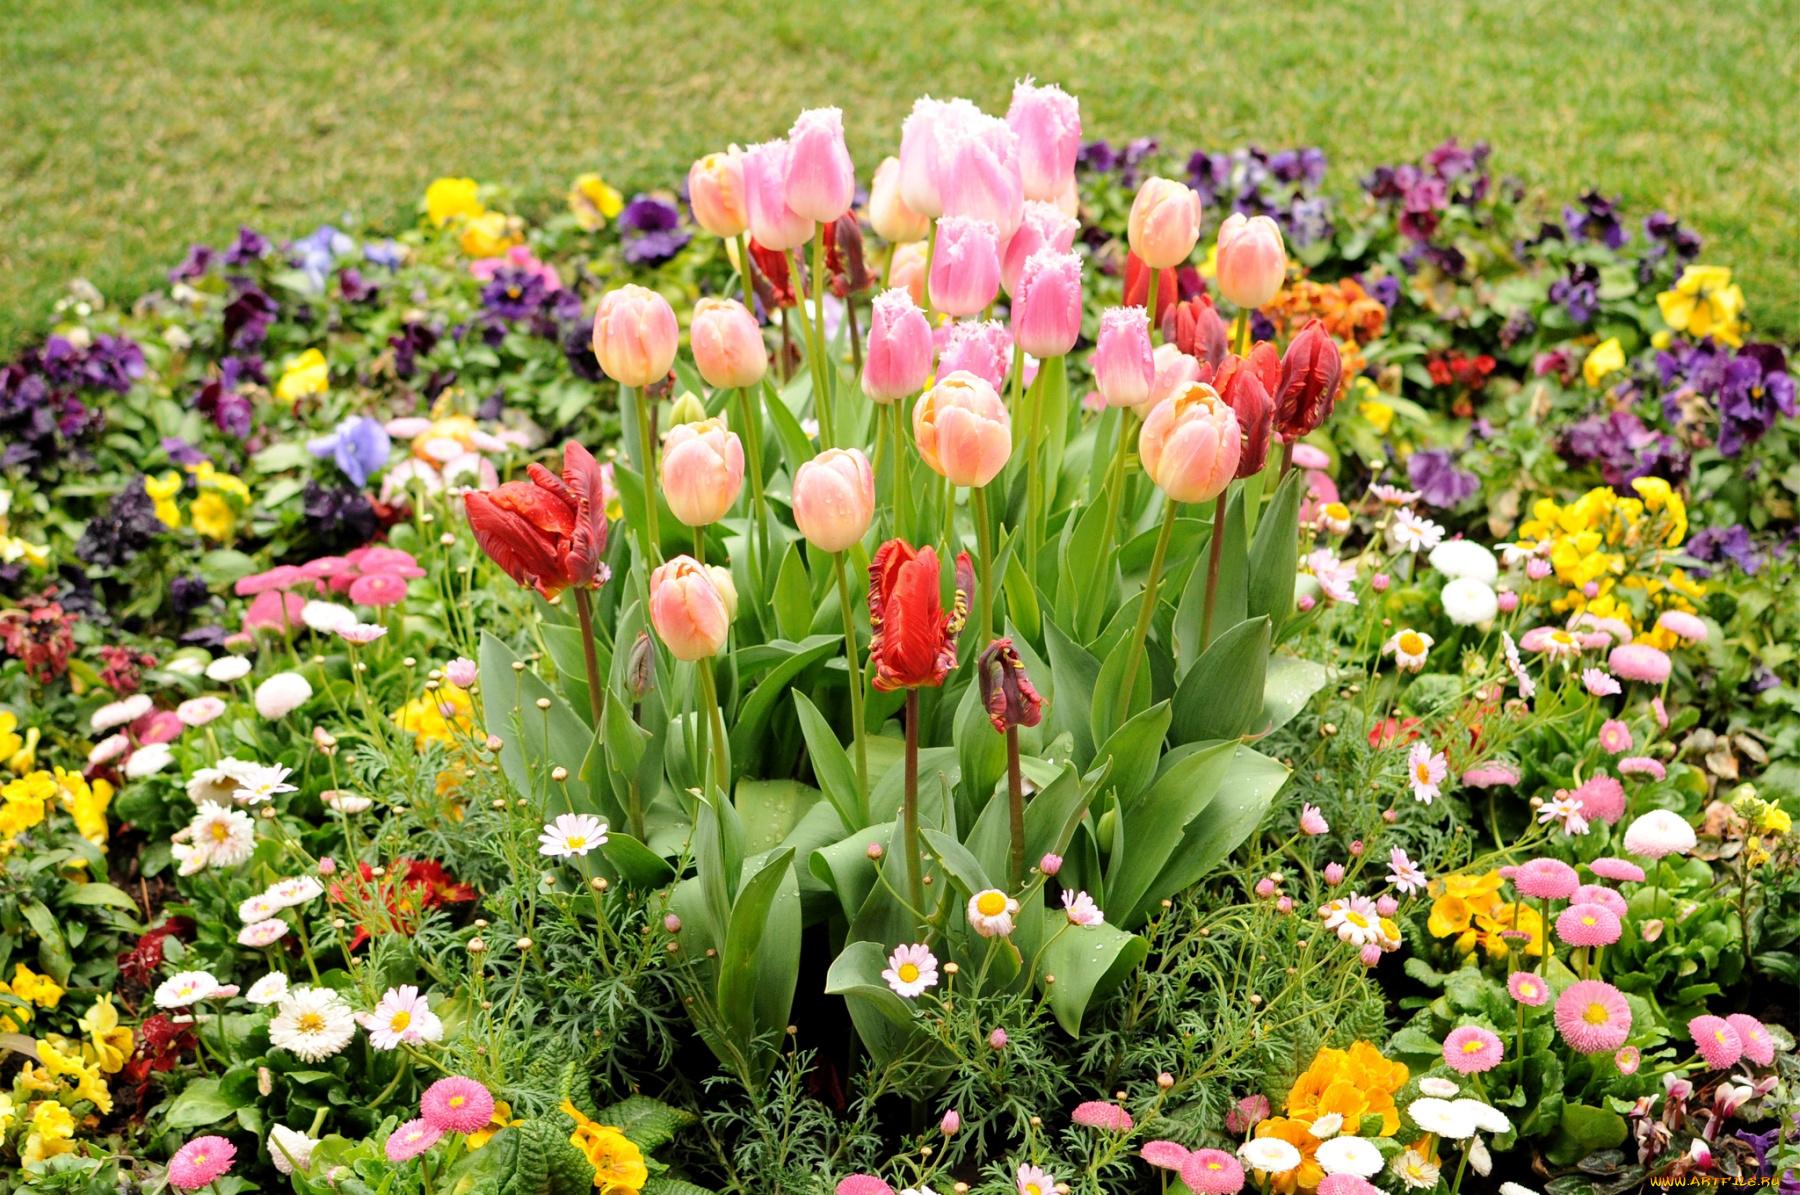 тюльпаны клумба  № 1349352 бесплатно